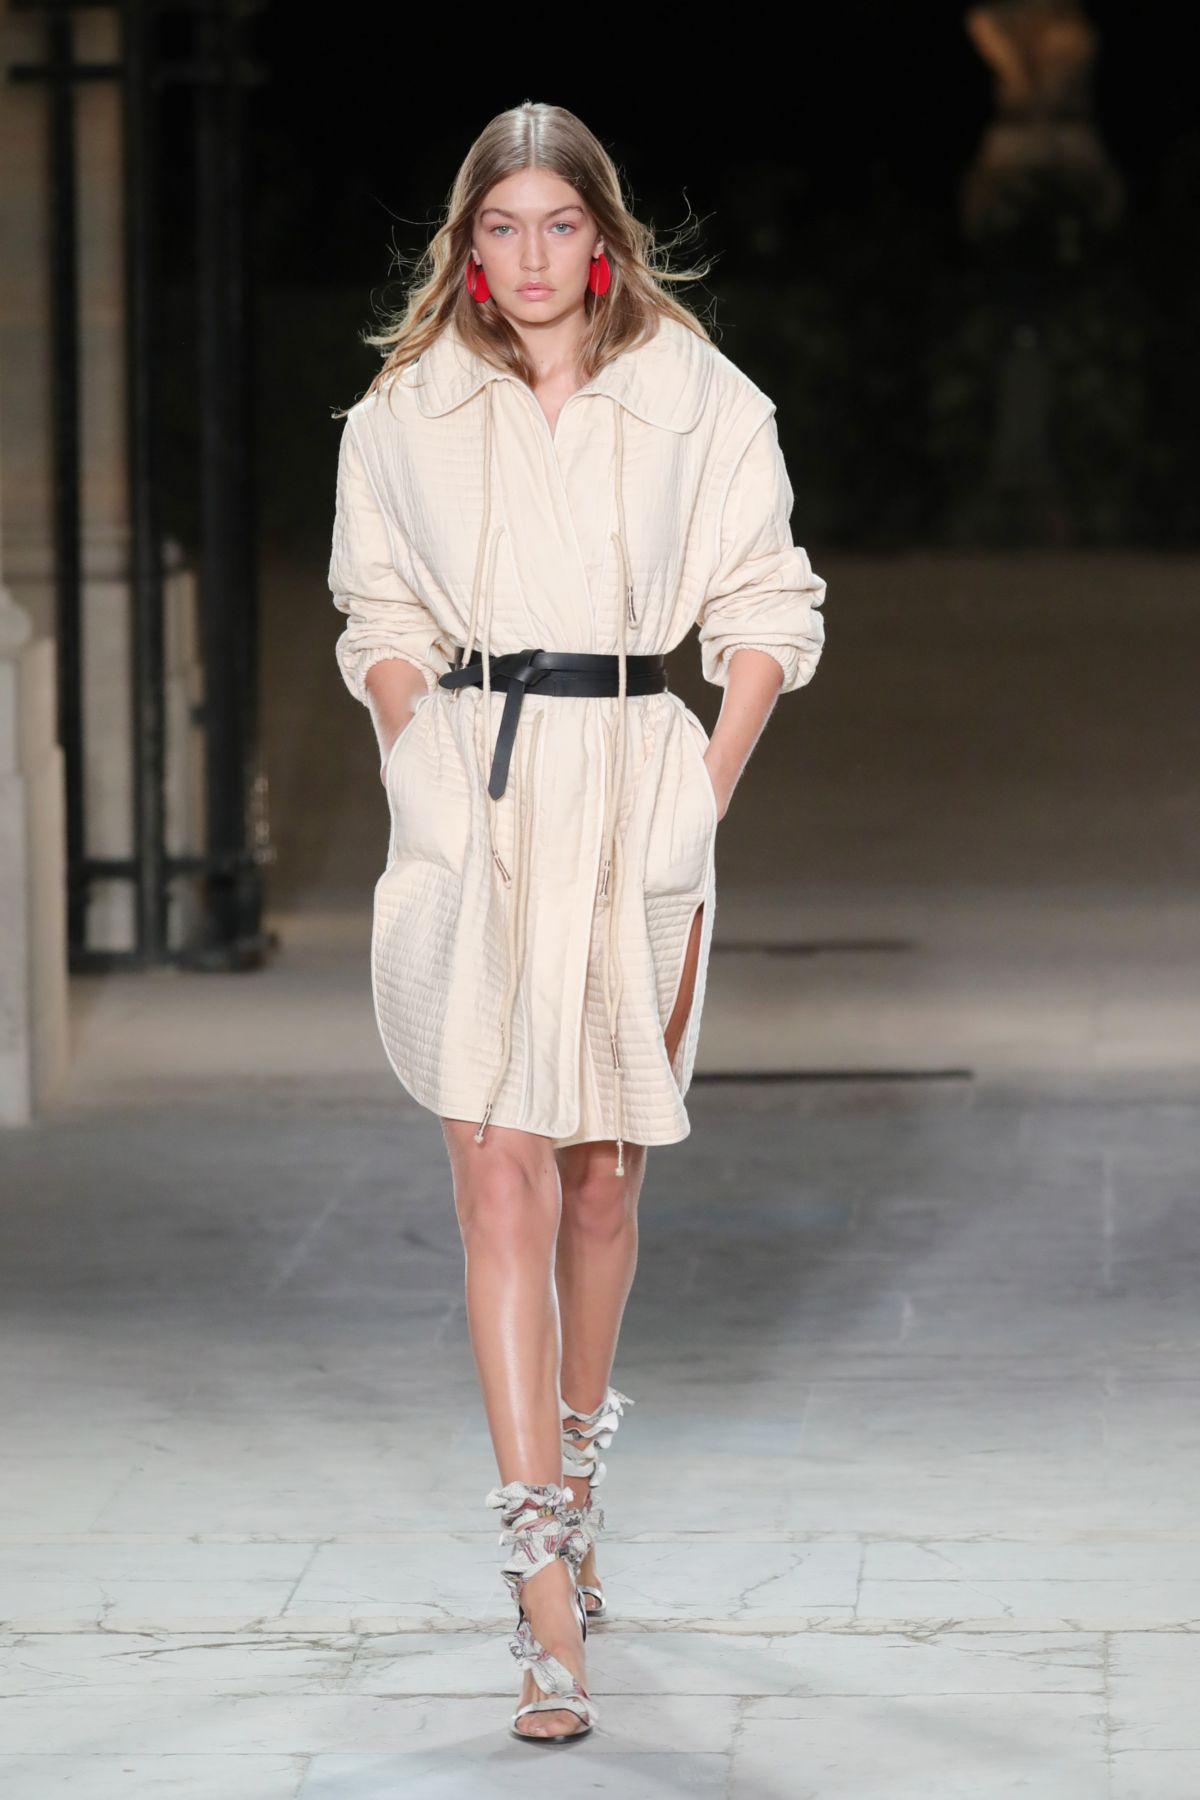 Gigi hadid at isabel marant show at paris fashion week 09 for Gigi hadid fashion week